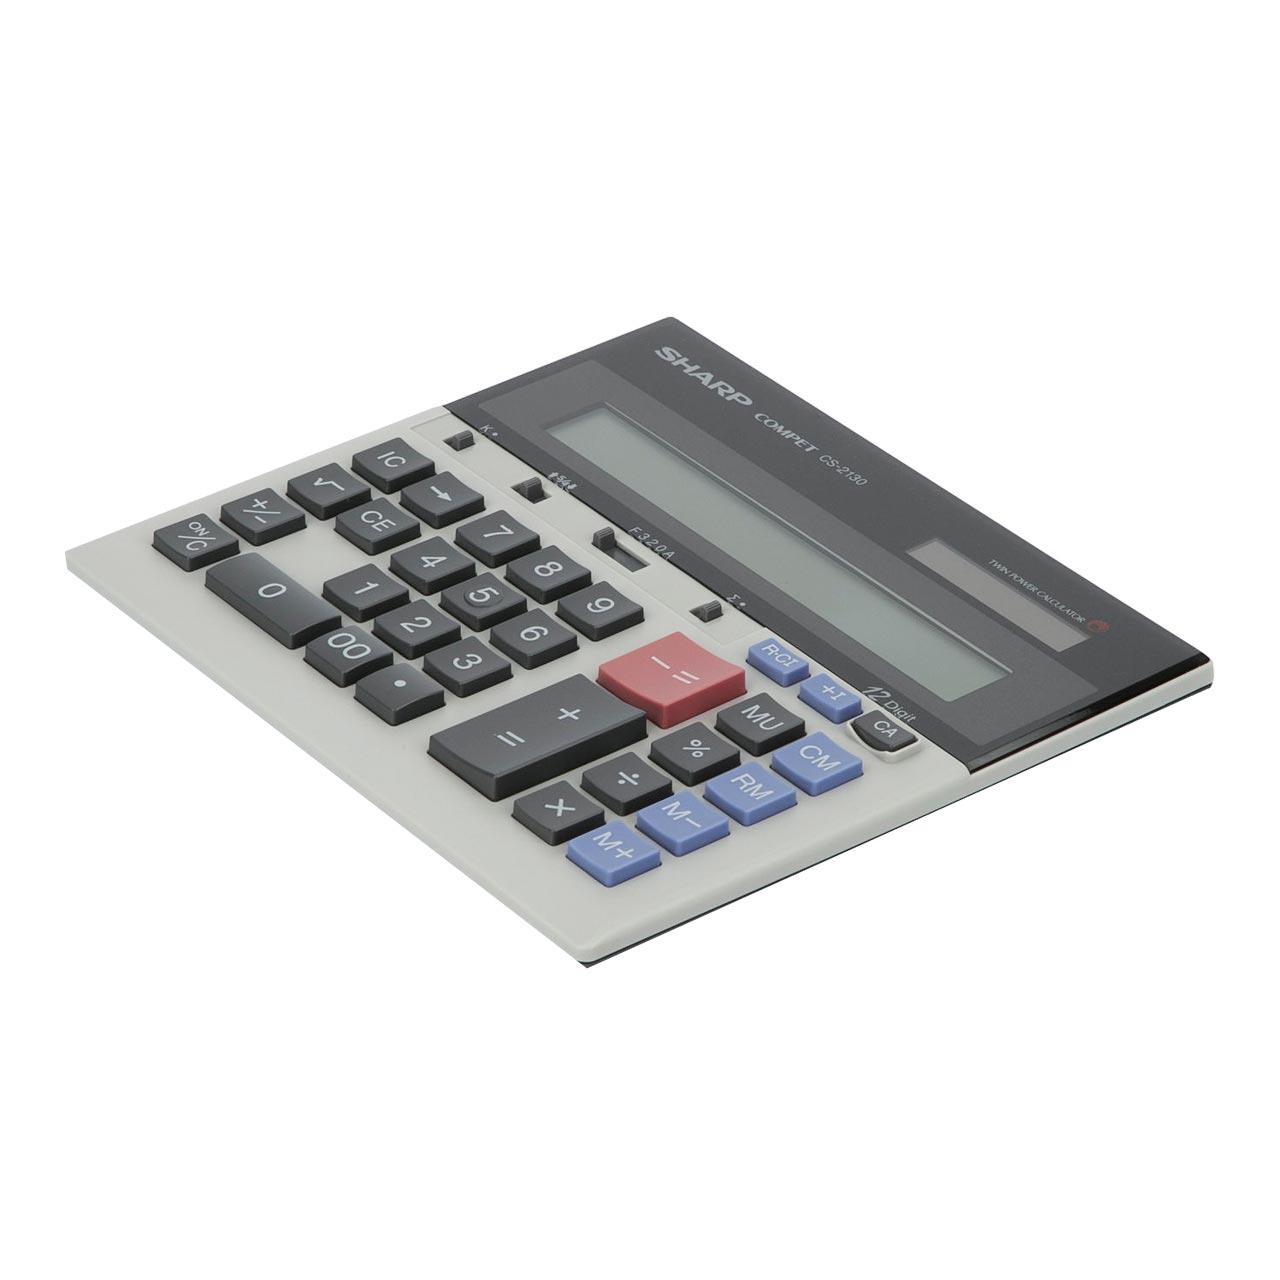 ماشین حساب شارپ کد as-233-ki مدل CS-2130